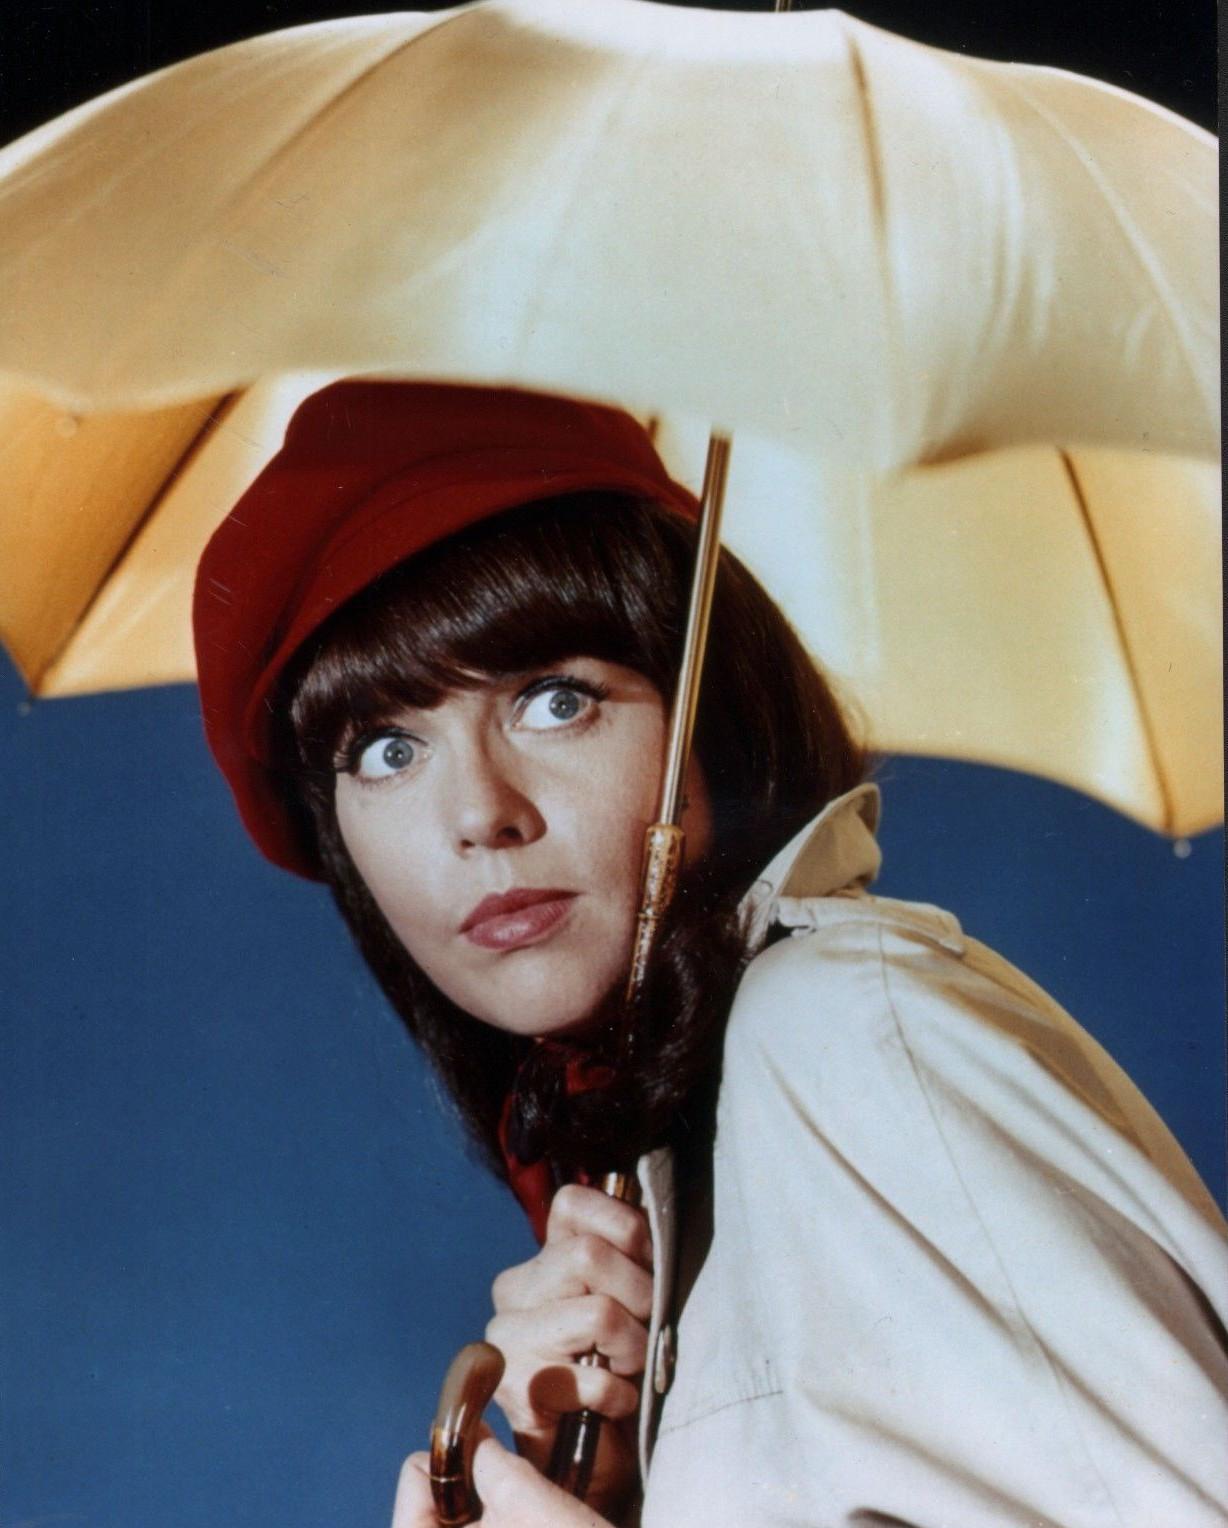 barbara feldon with an umbrella 24 femmes per second